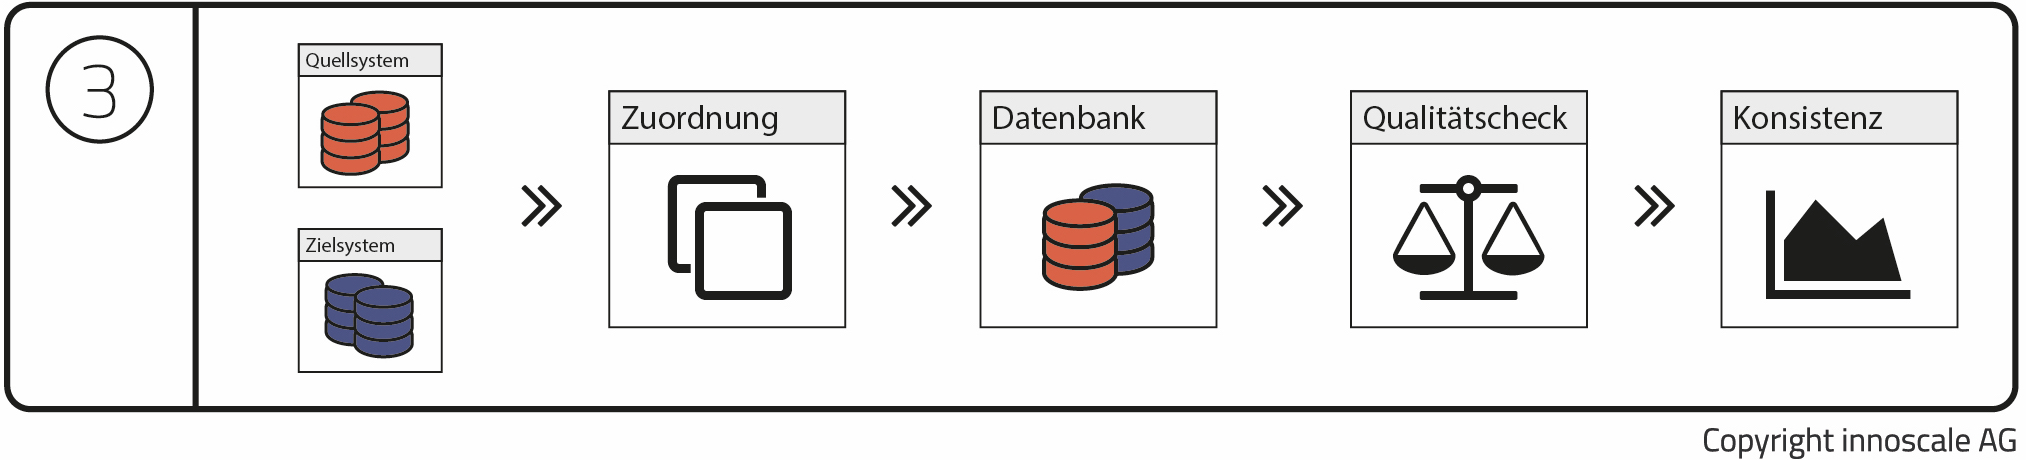 Datenmigration: Konsistenzcheck